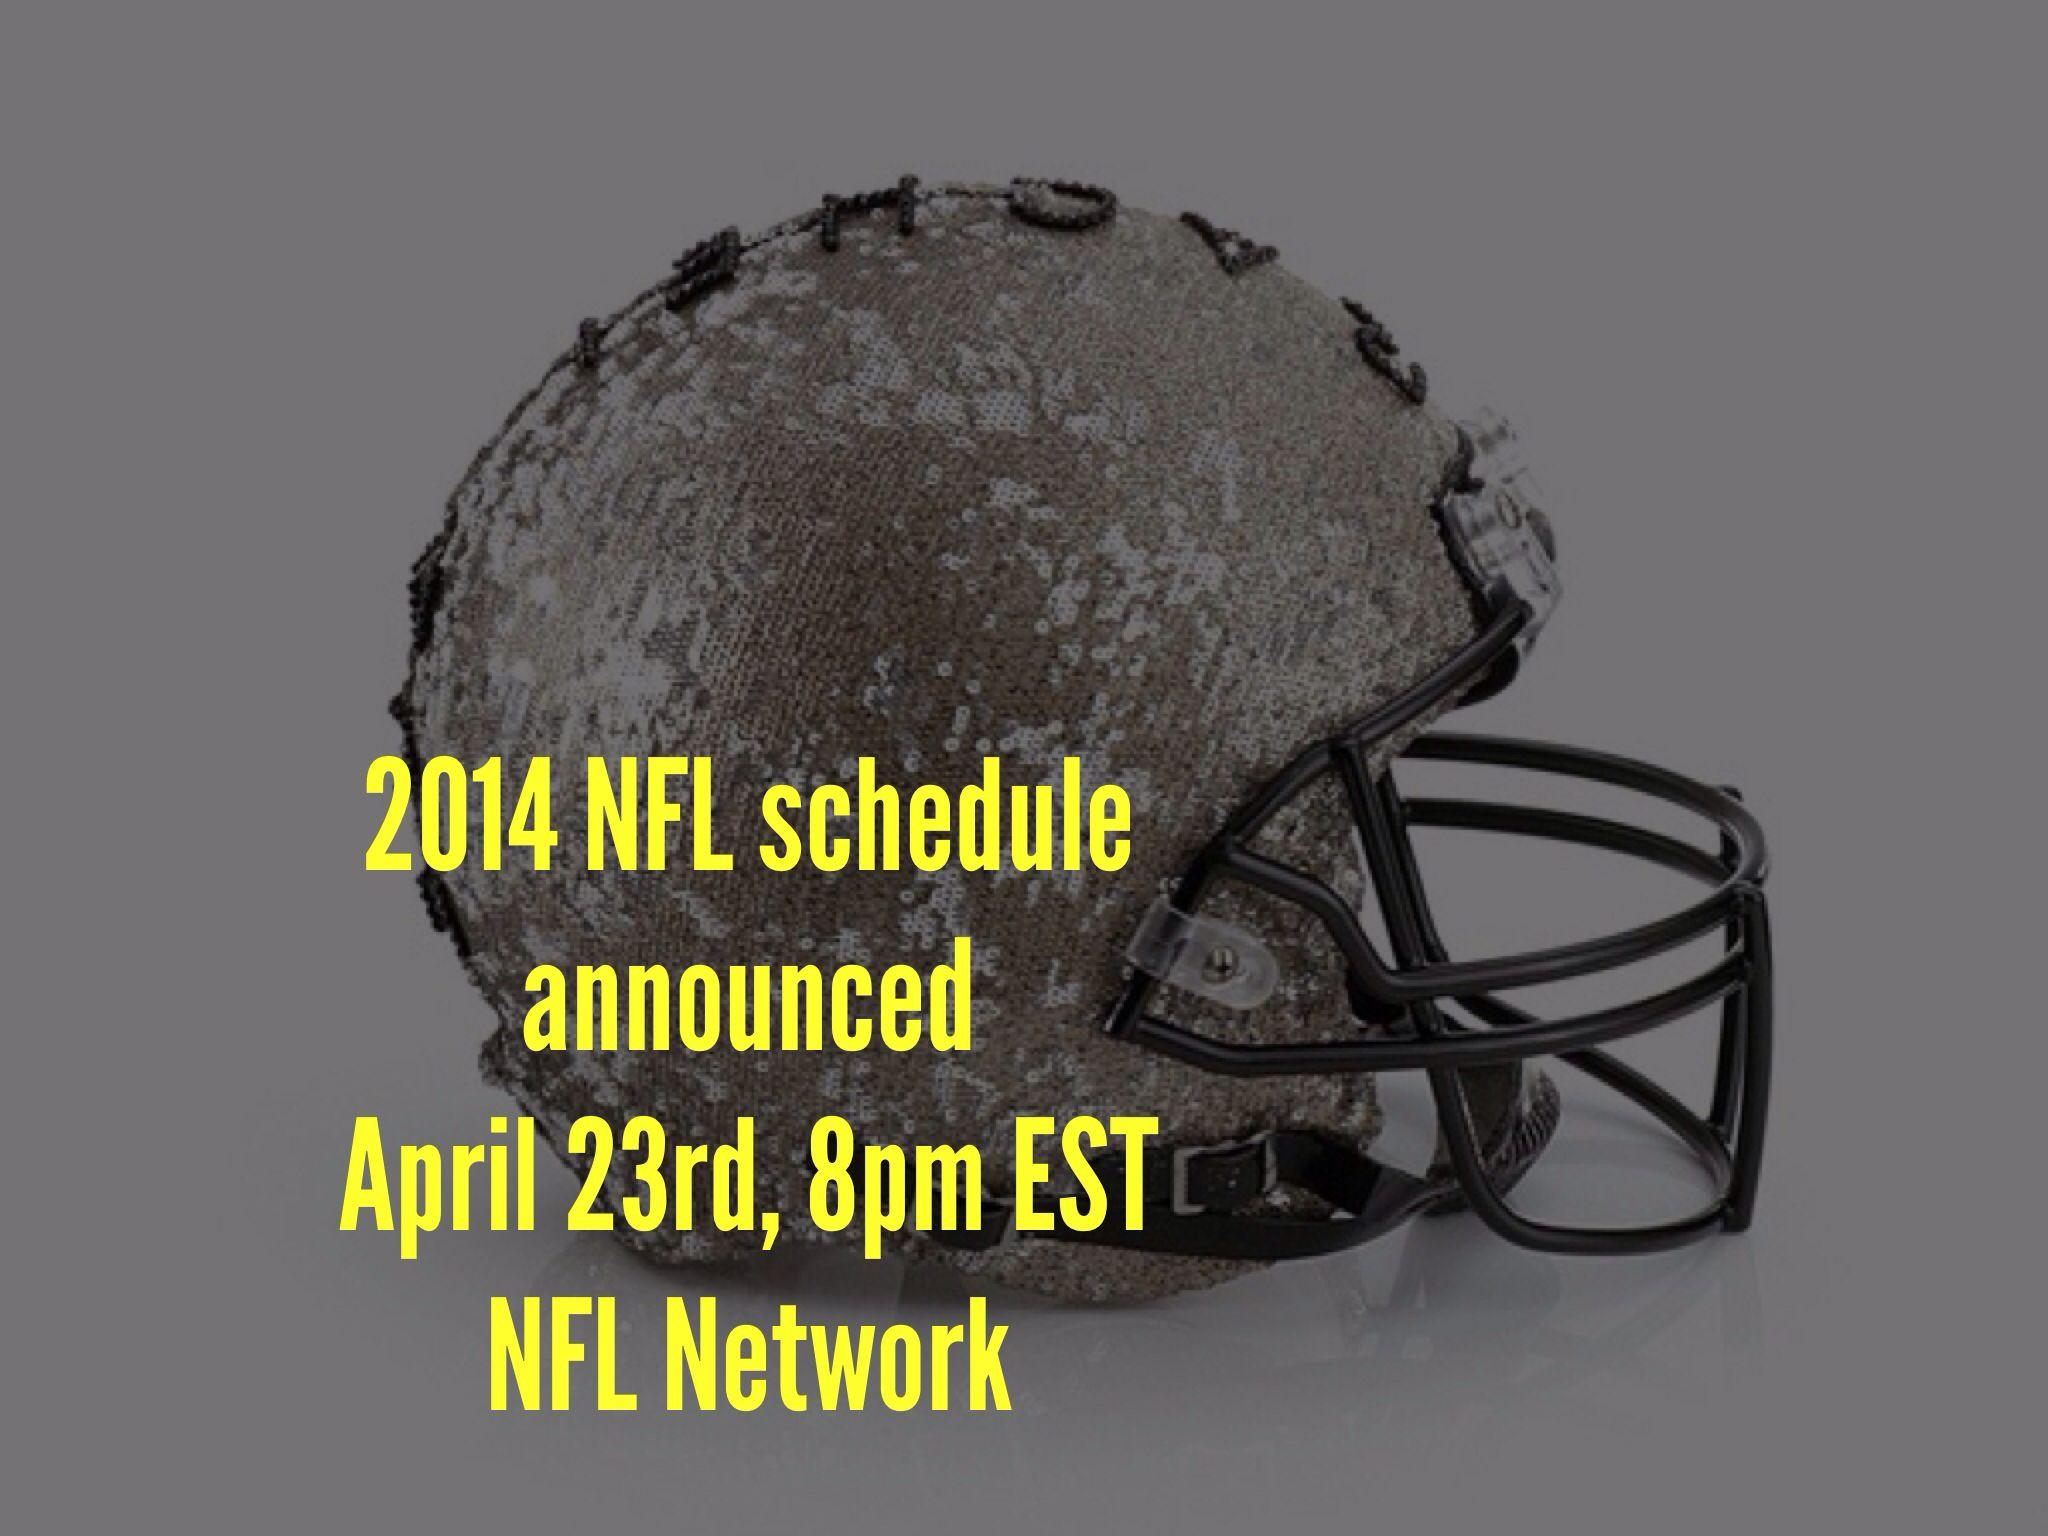 2014 @Paige Wilczek schedule announced on April 23rd, 8pm EST on NFL Network! #nfl #nflnetwork #FootballFashion #FootballGlam